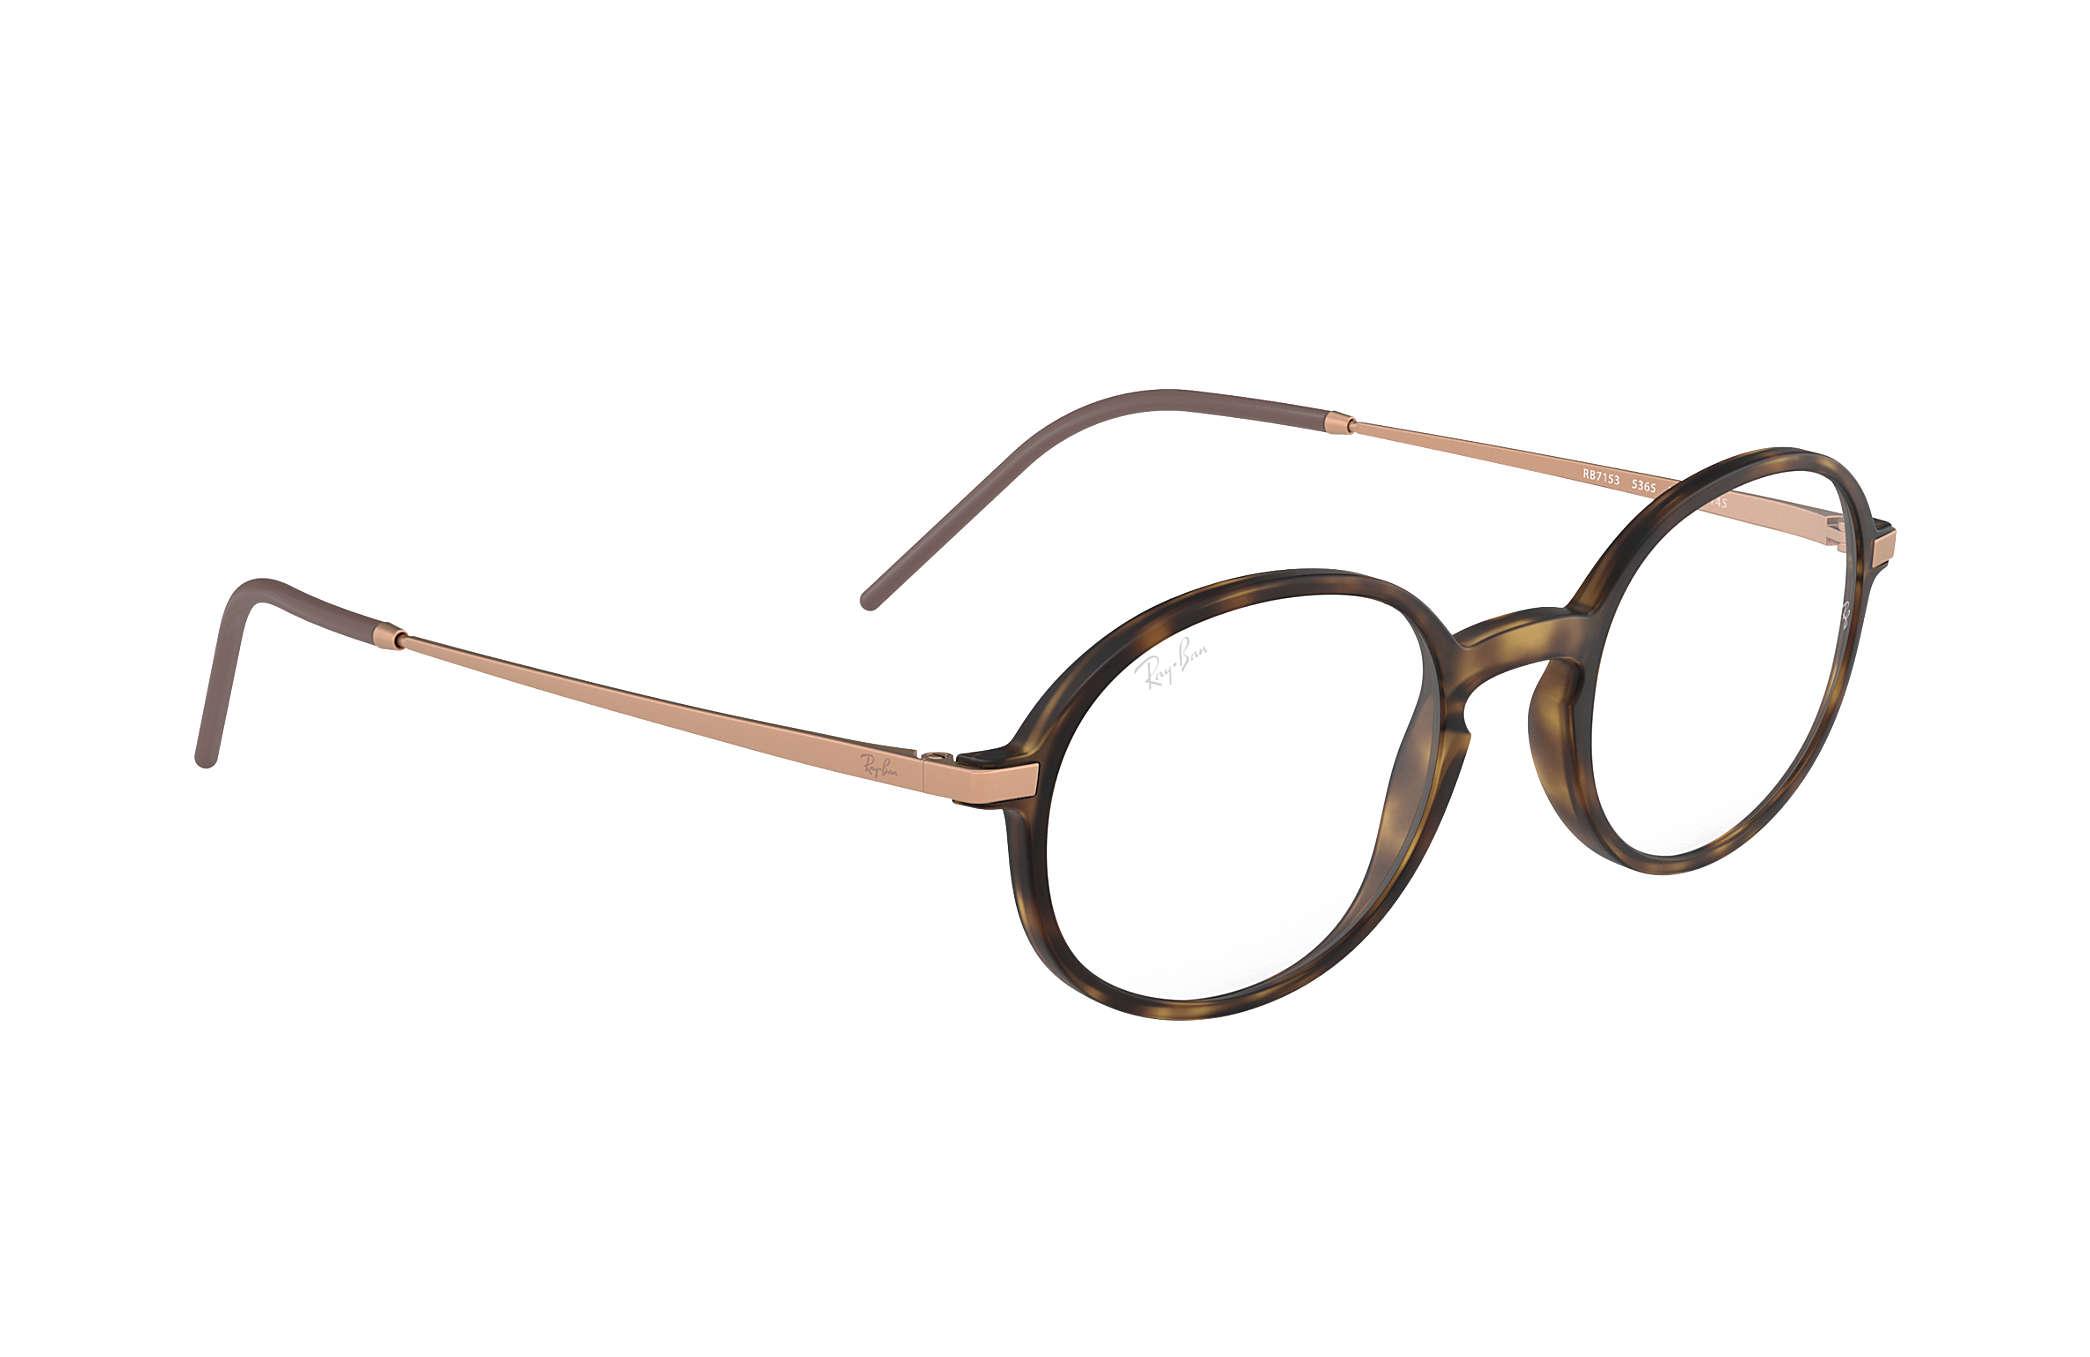 Óculos de grau Ray-Ban RB7153 Tartaruga - Injetado - 0RX7153536552 ... dd845409cc